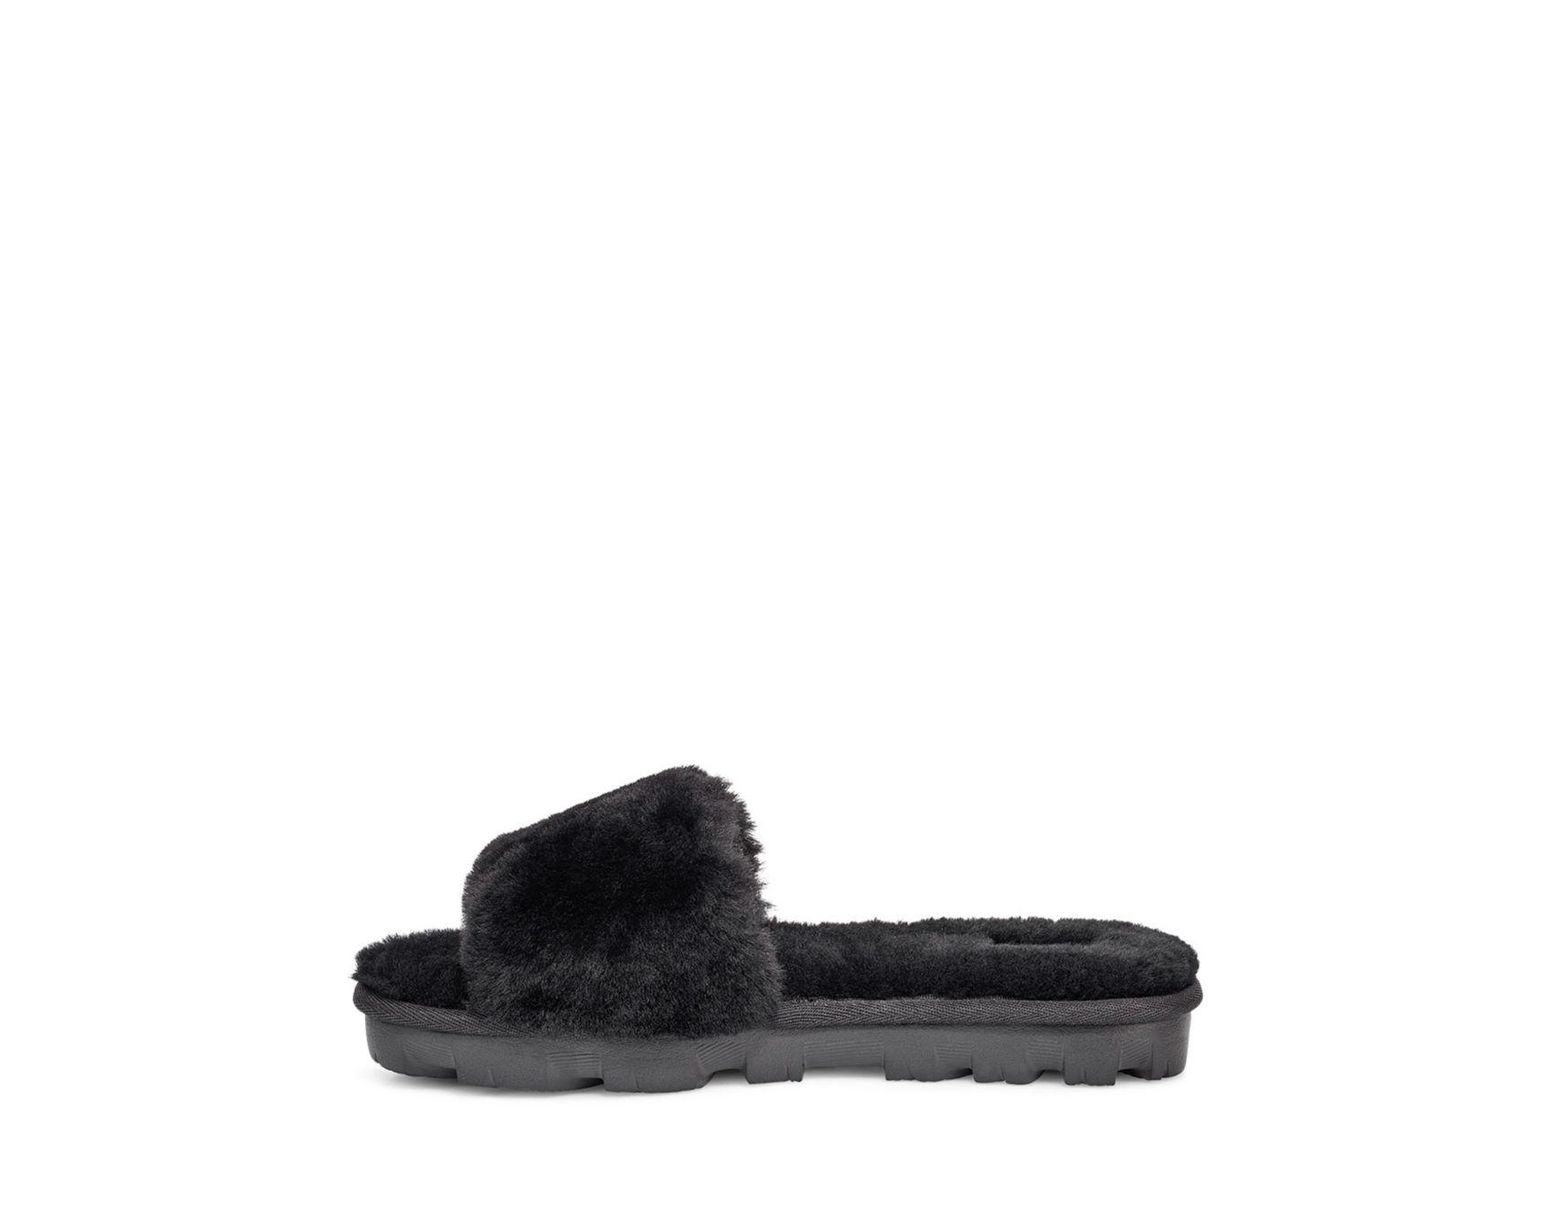 548e29d16 UGG Women's Cozette Fur Slide Sandals in Black - Lyst